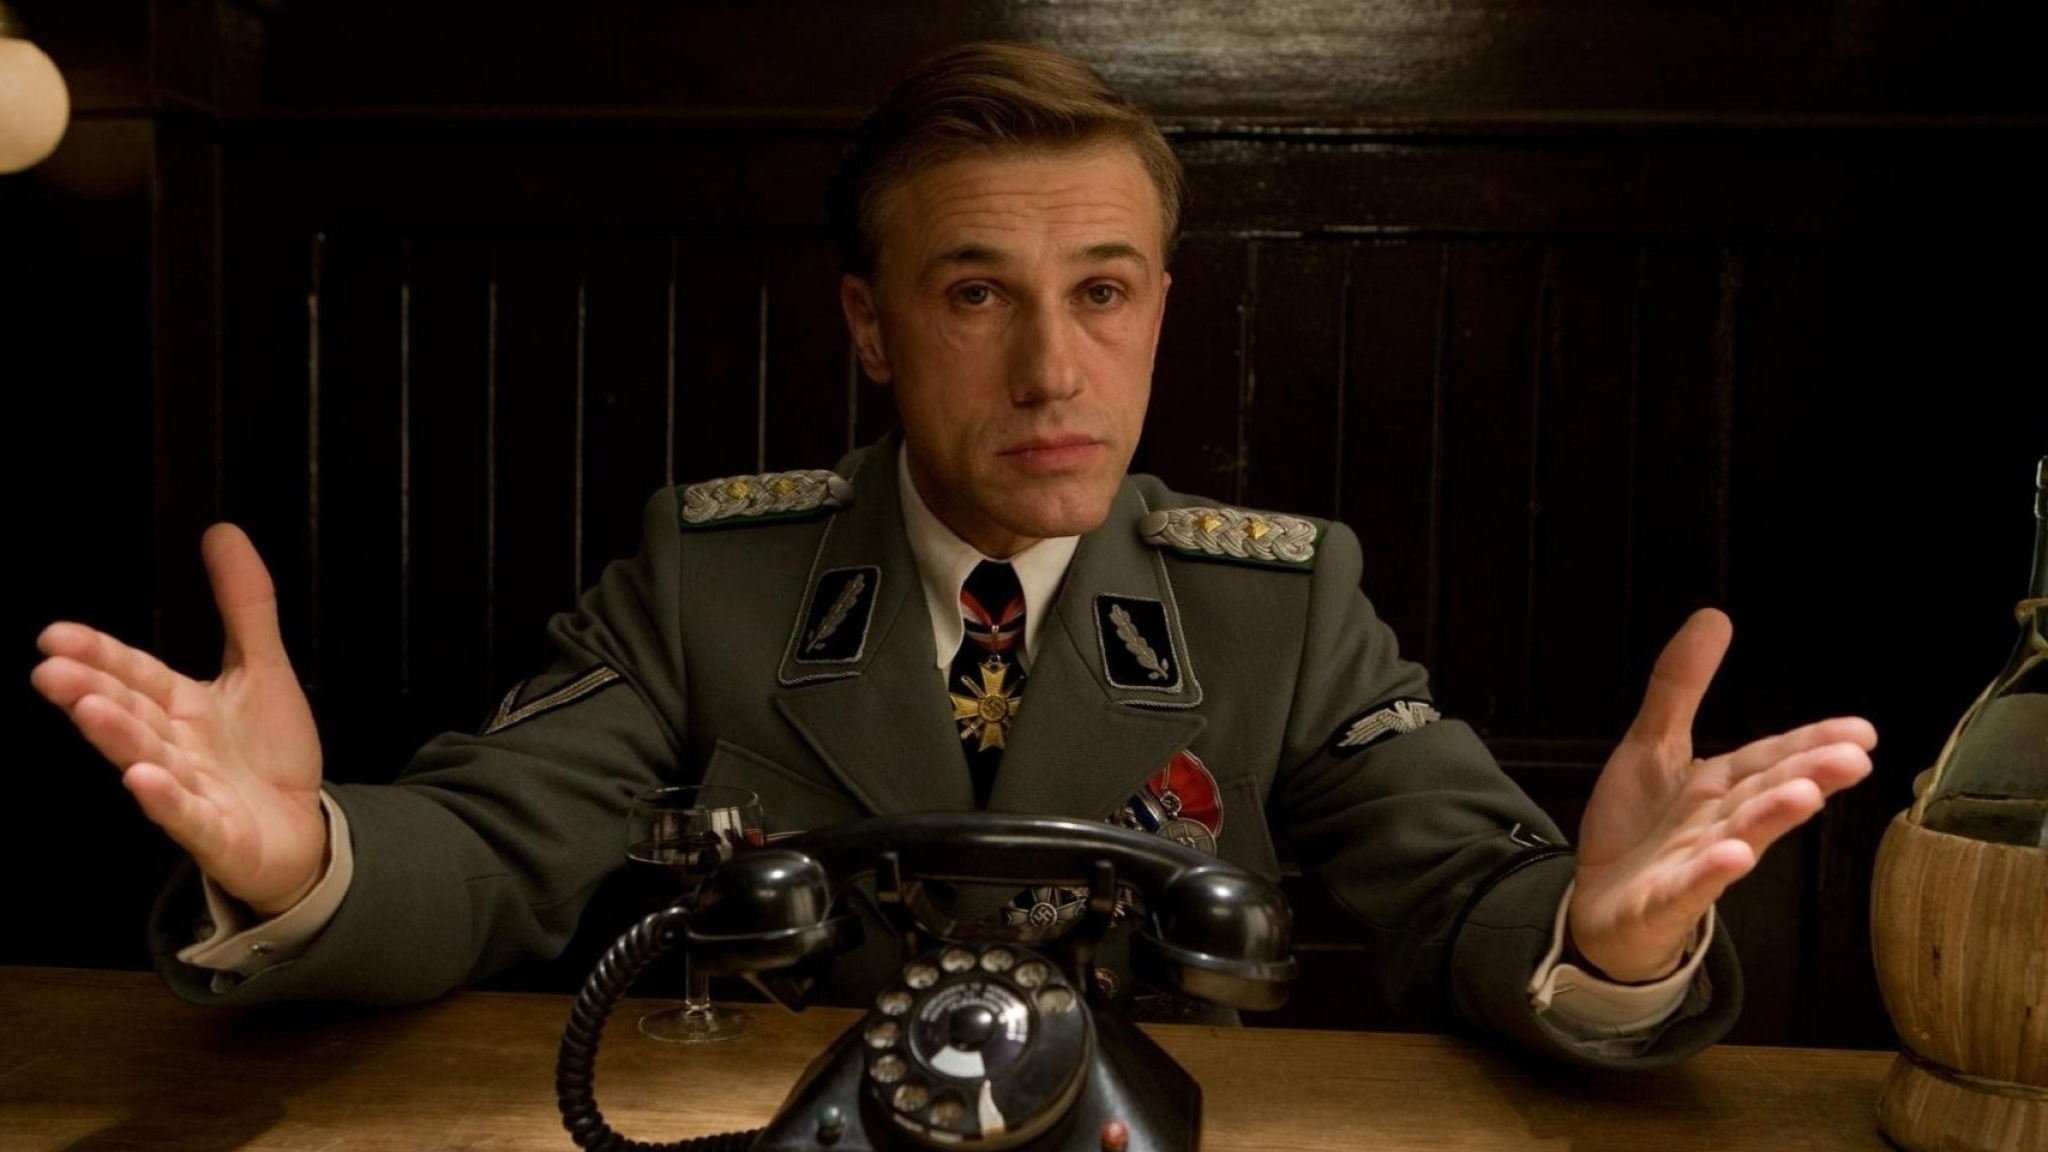 Christoph-Waltz-Bezslavnye-Bastards-Actor-1536x2048.jpg